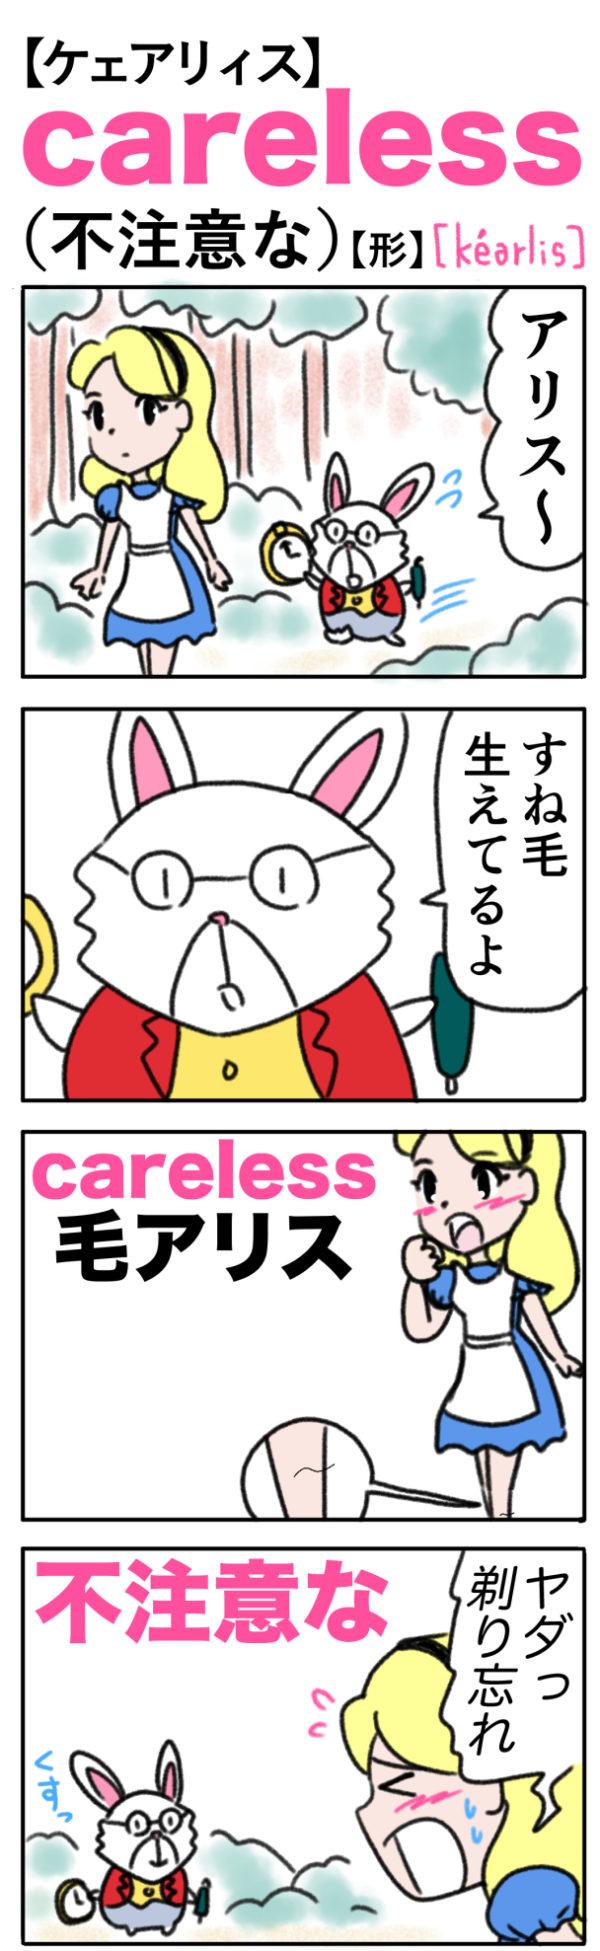 careless(不注意な)の語呂合わせ英単語